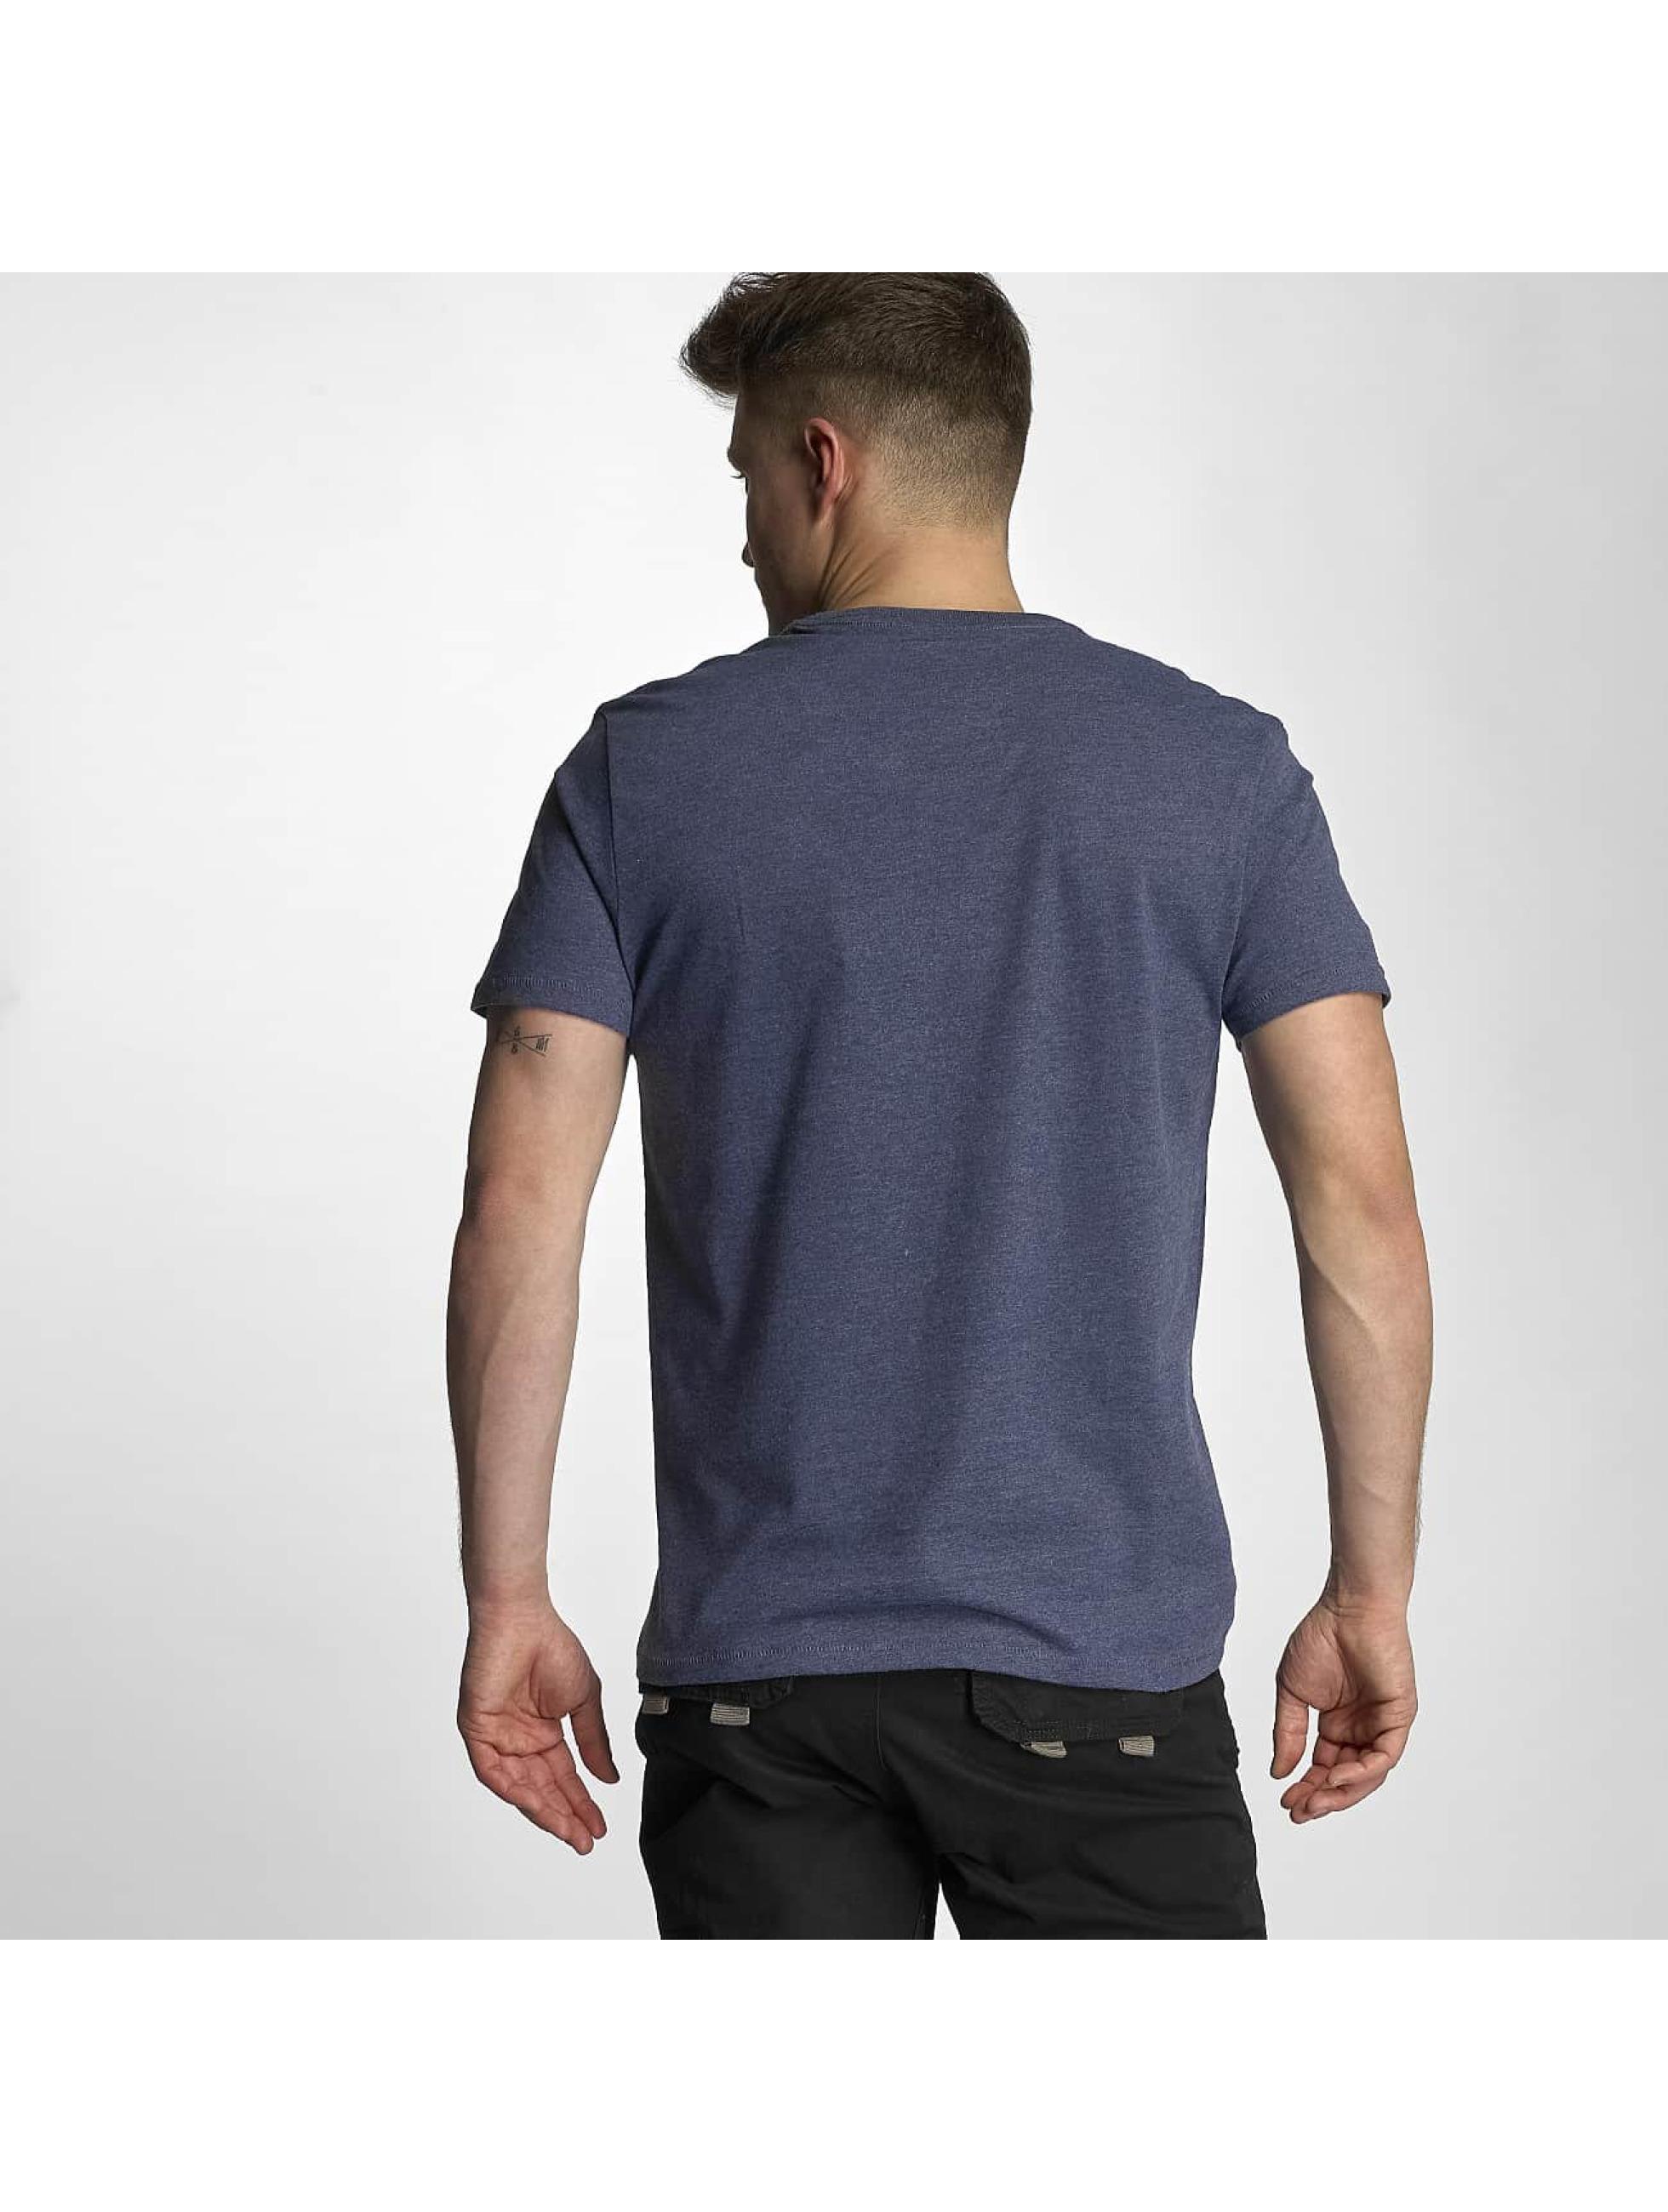 Cordon T-Shirt Jens indigo